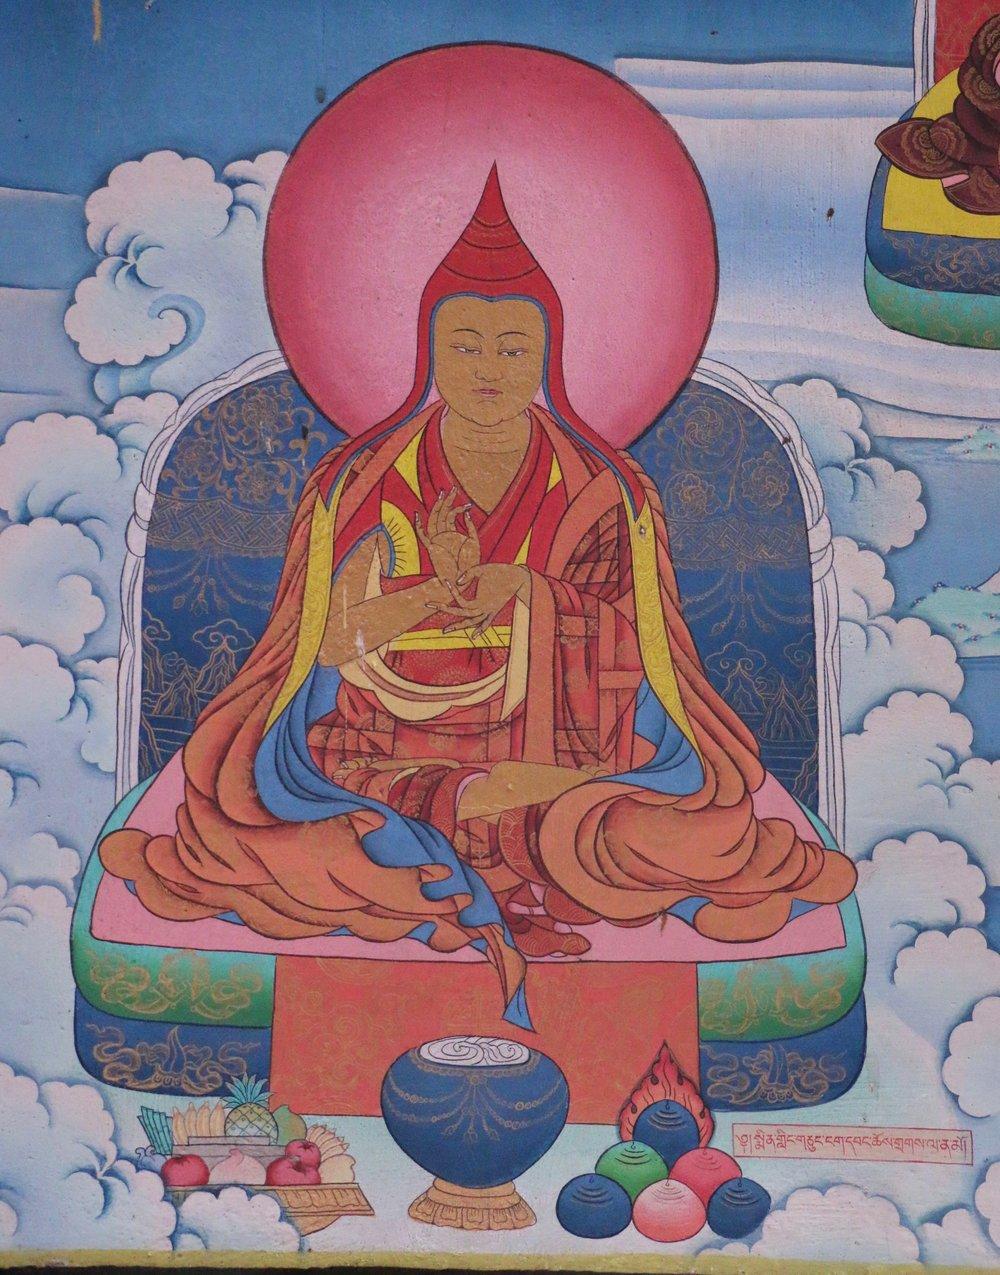 Mindrolling Chung Ngawang Chodrak